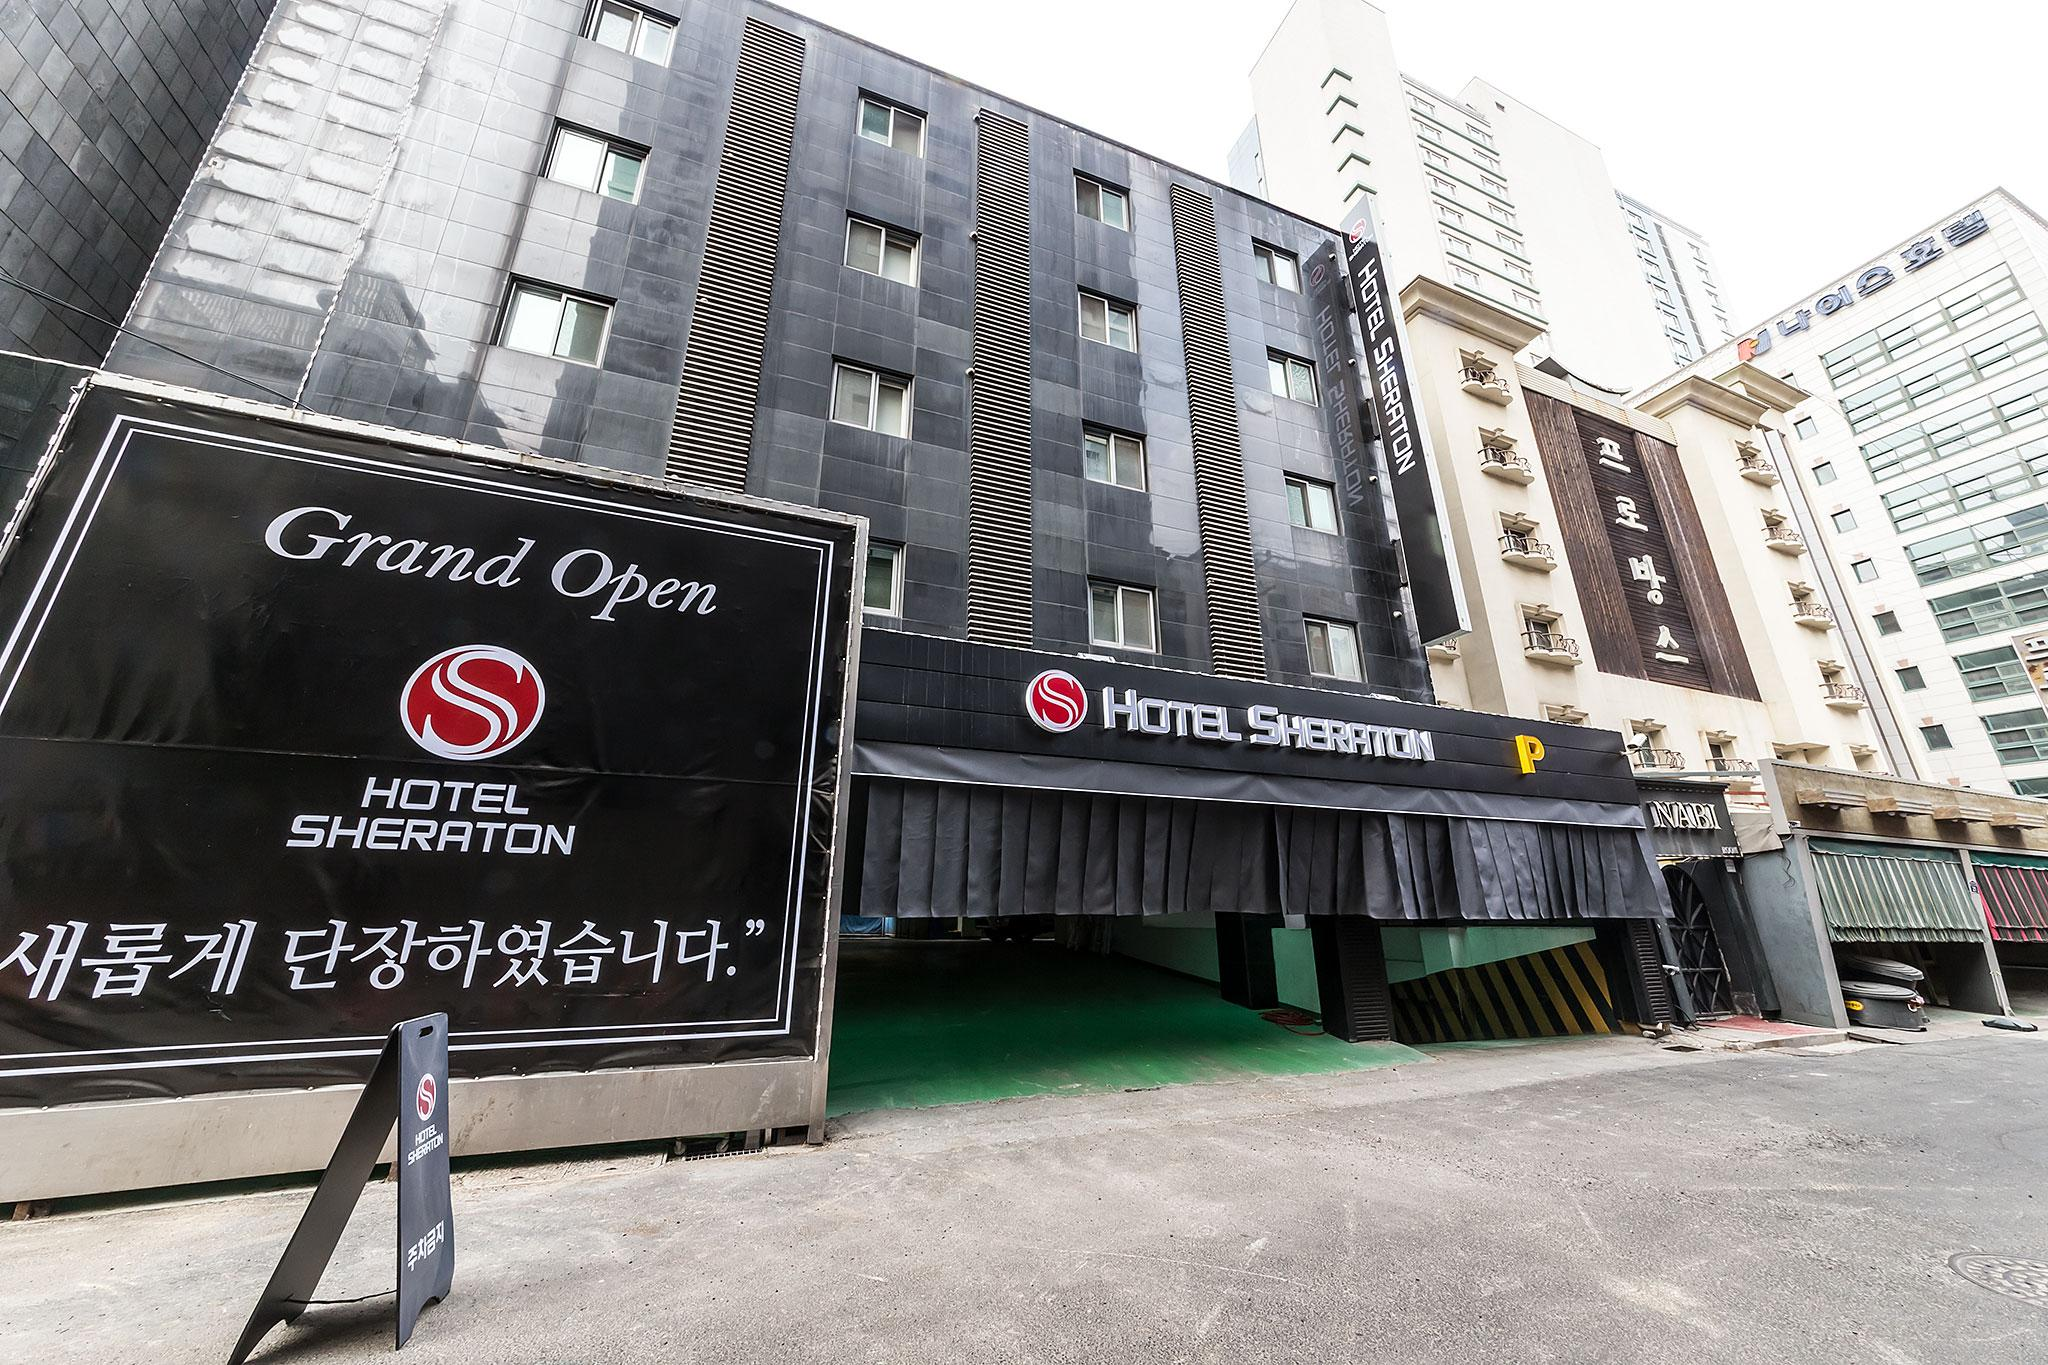 Review Hotel Sheraton